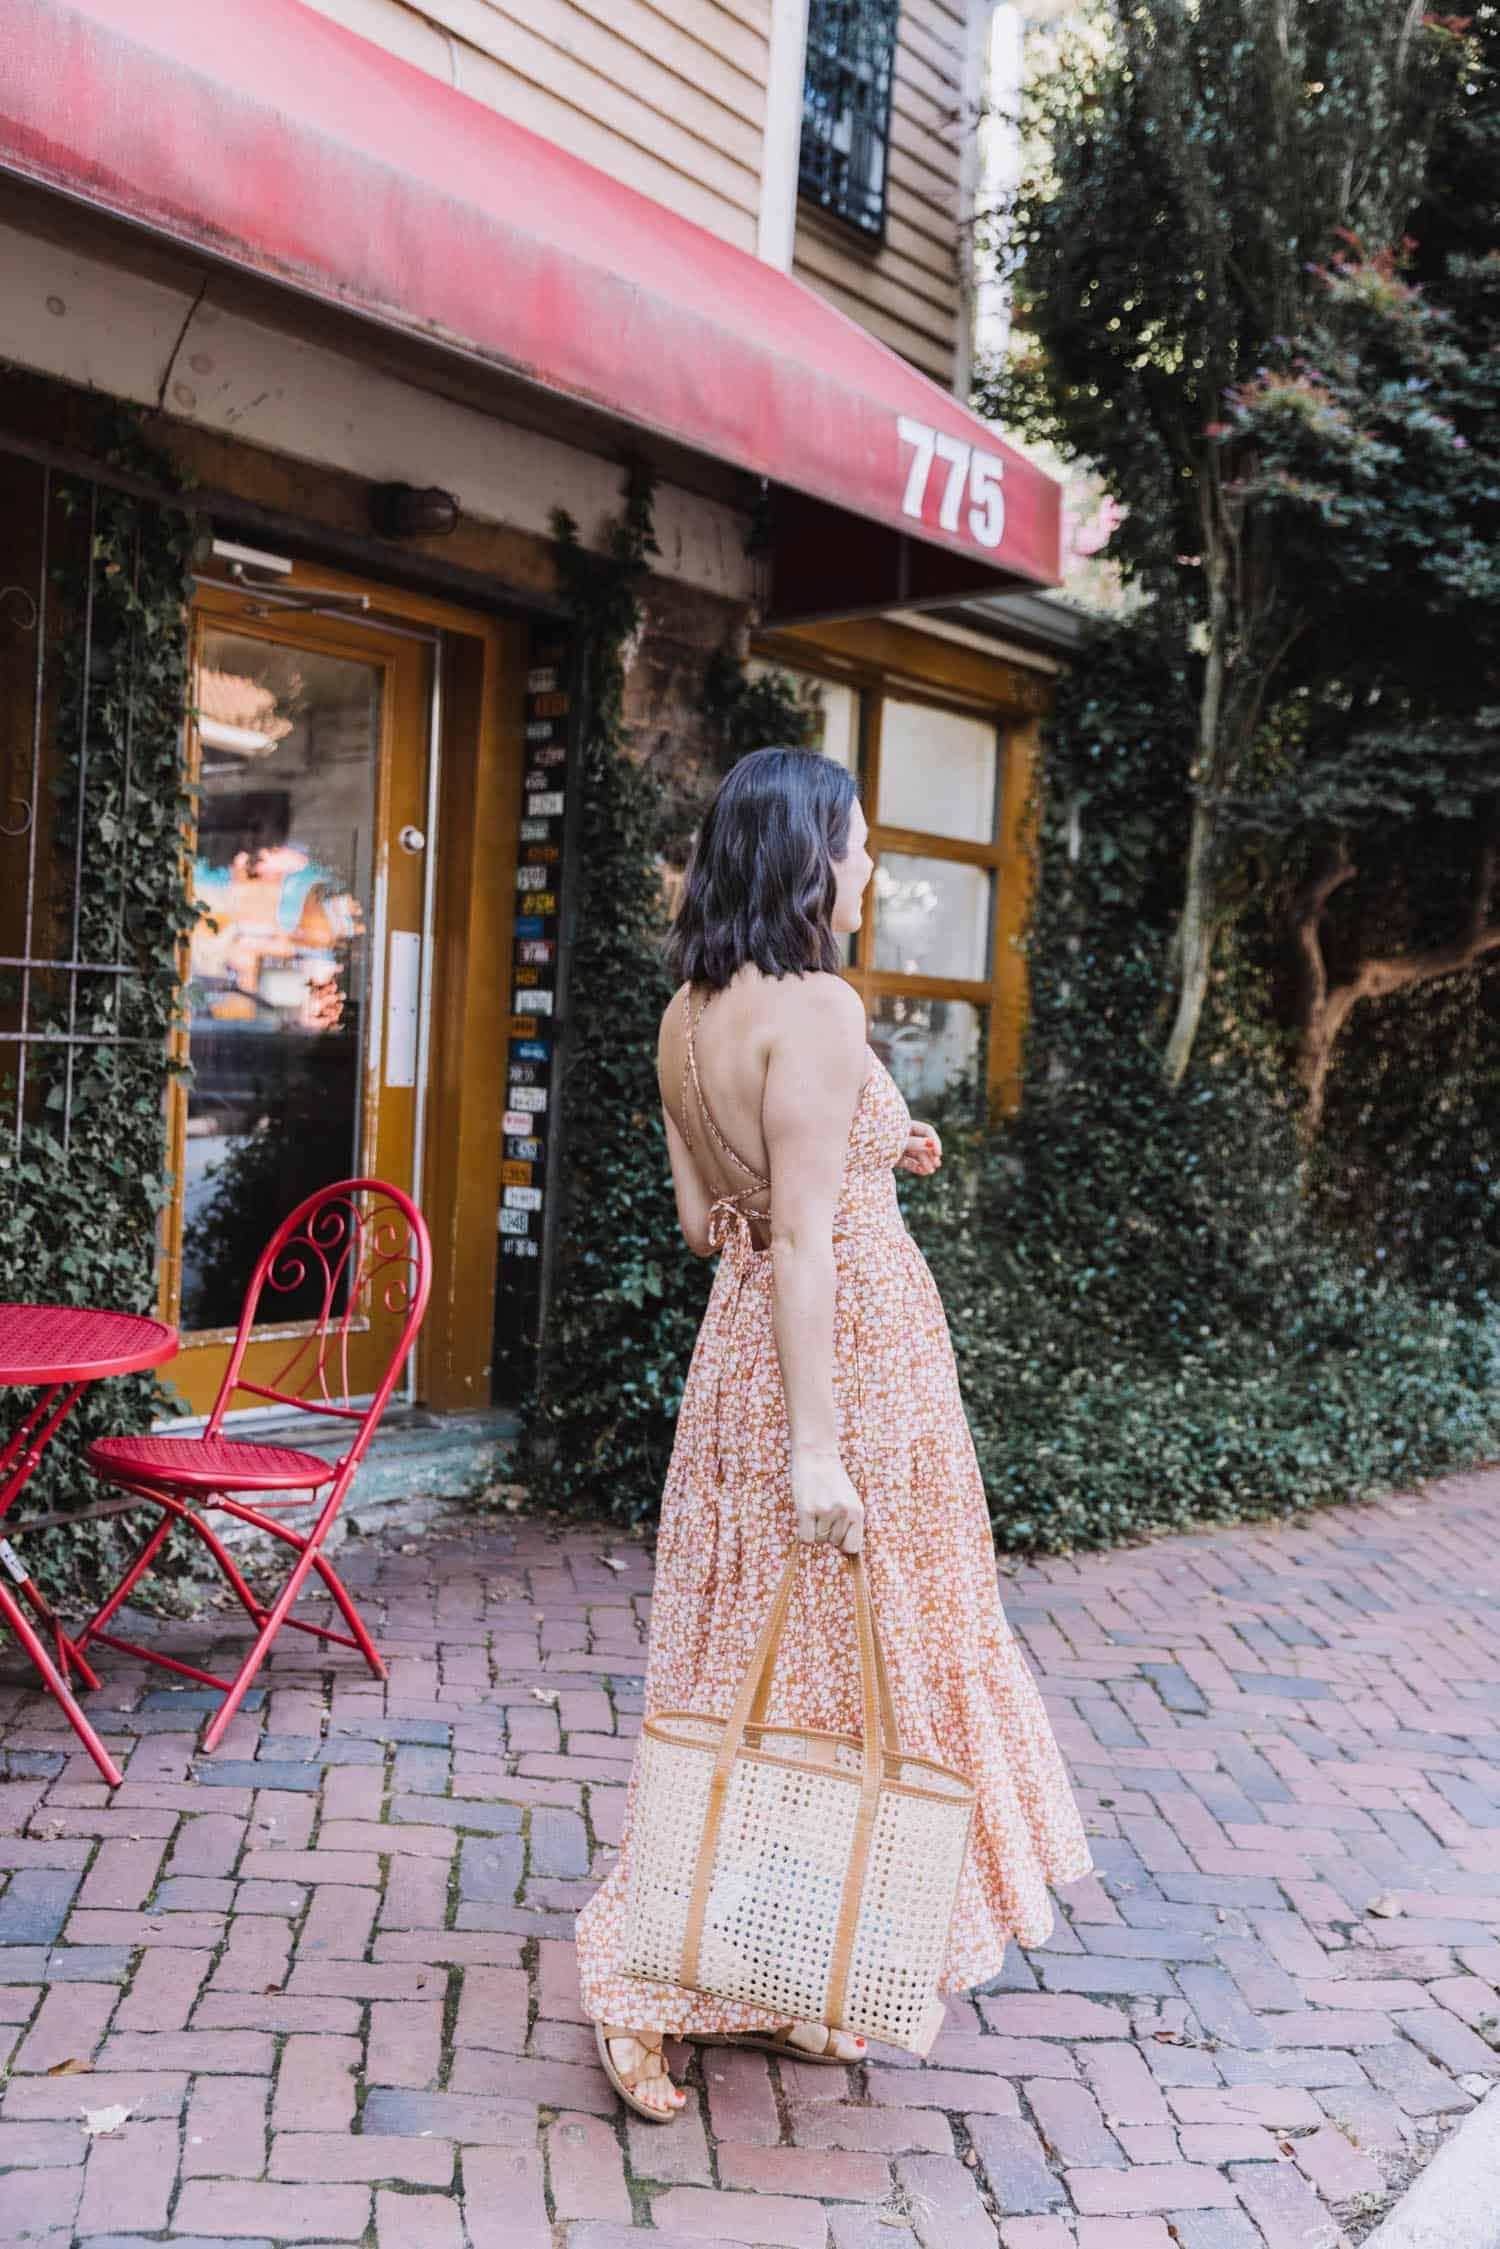 Xirena Owynn Dress Review